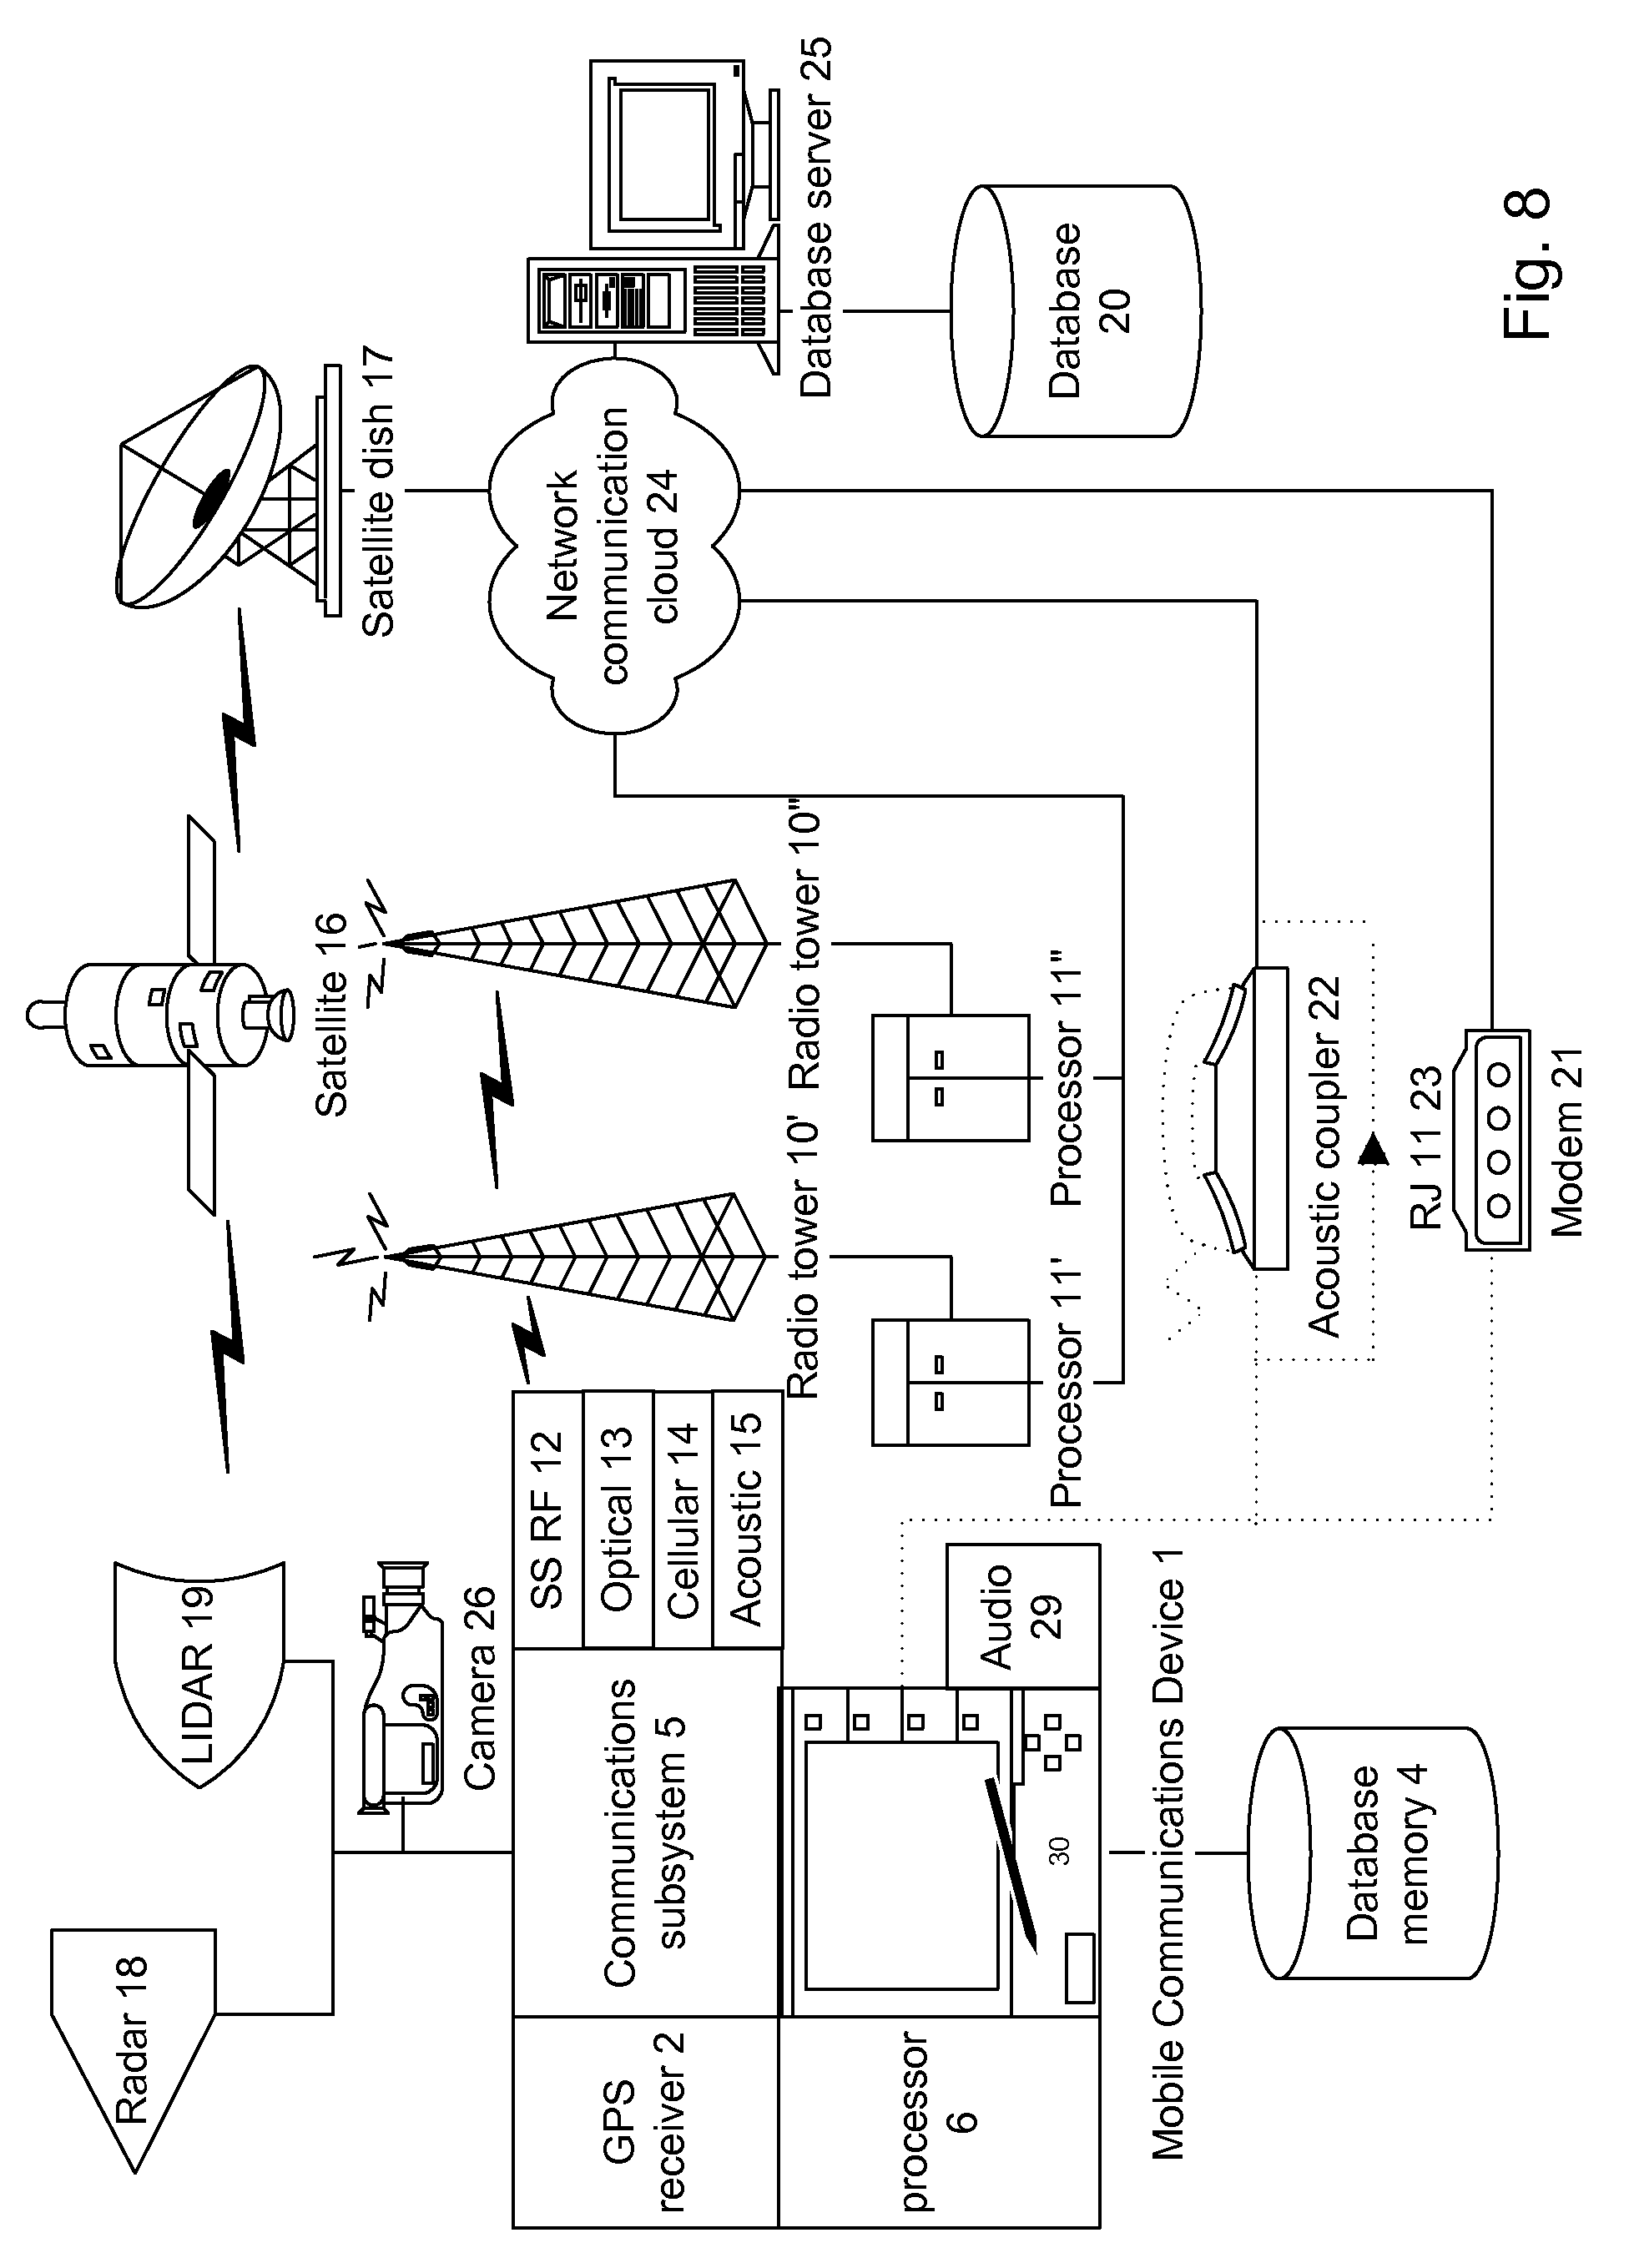 Patent Us 9311670 B2 1995 International Wiring Diagram Model 1ht